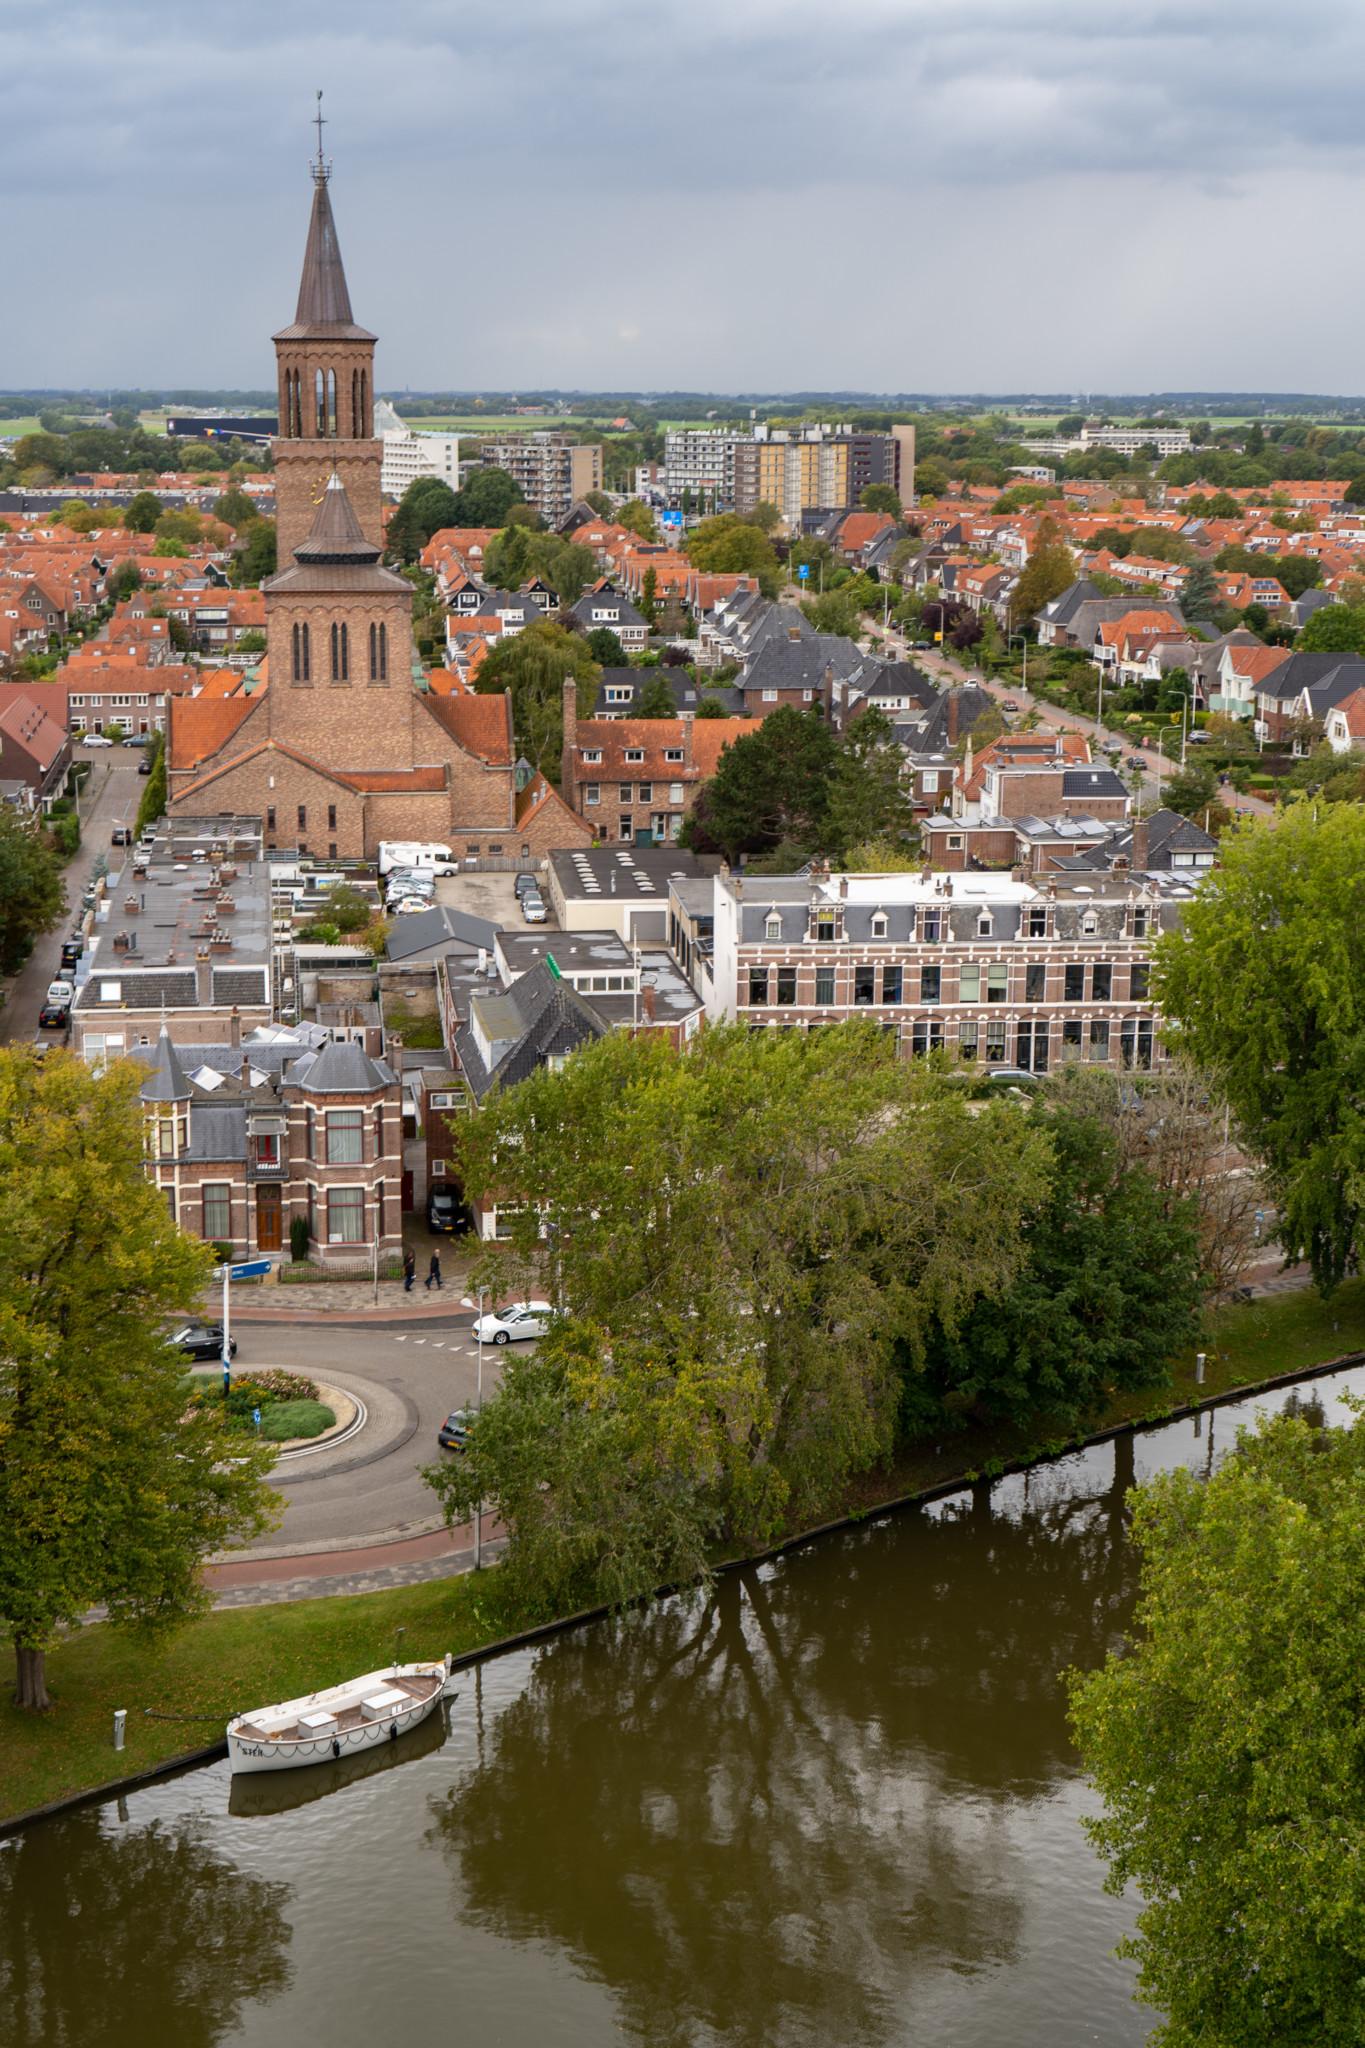 Saint Boniface Kirche in Leeuwarden